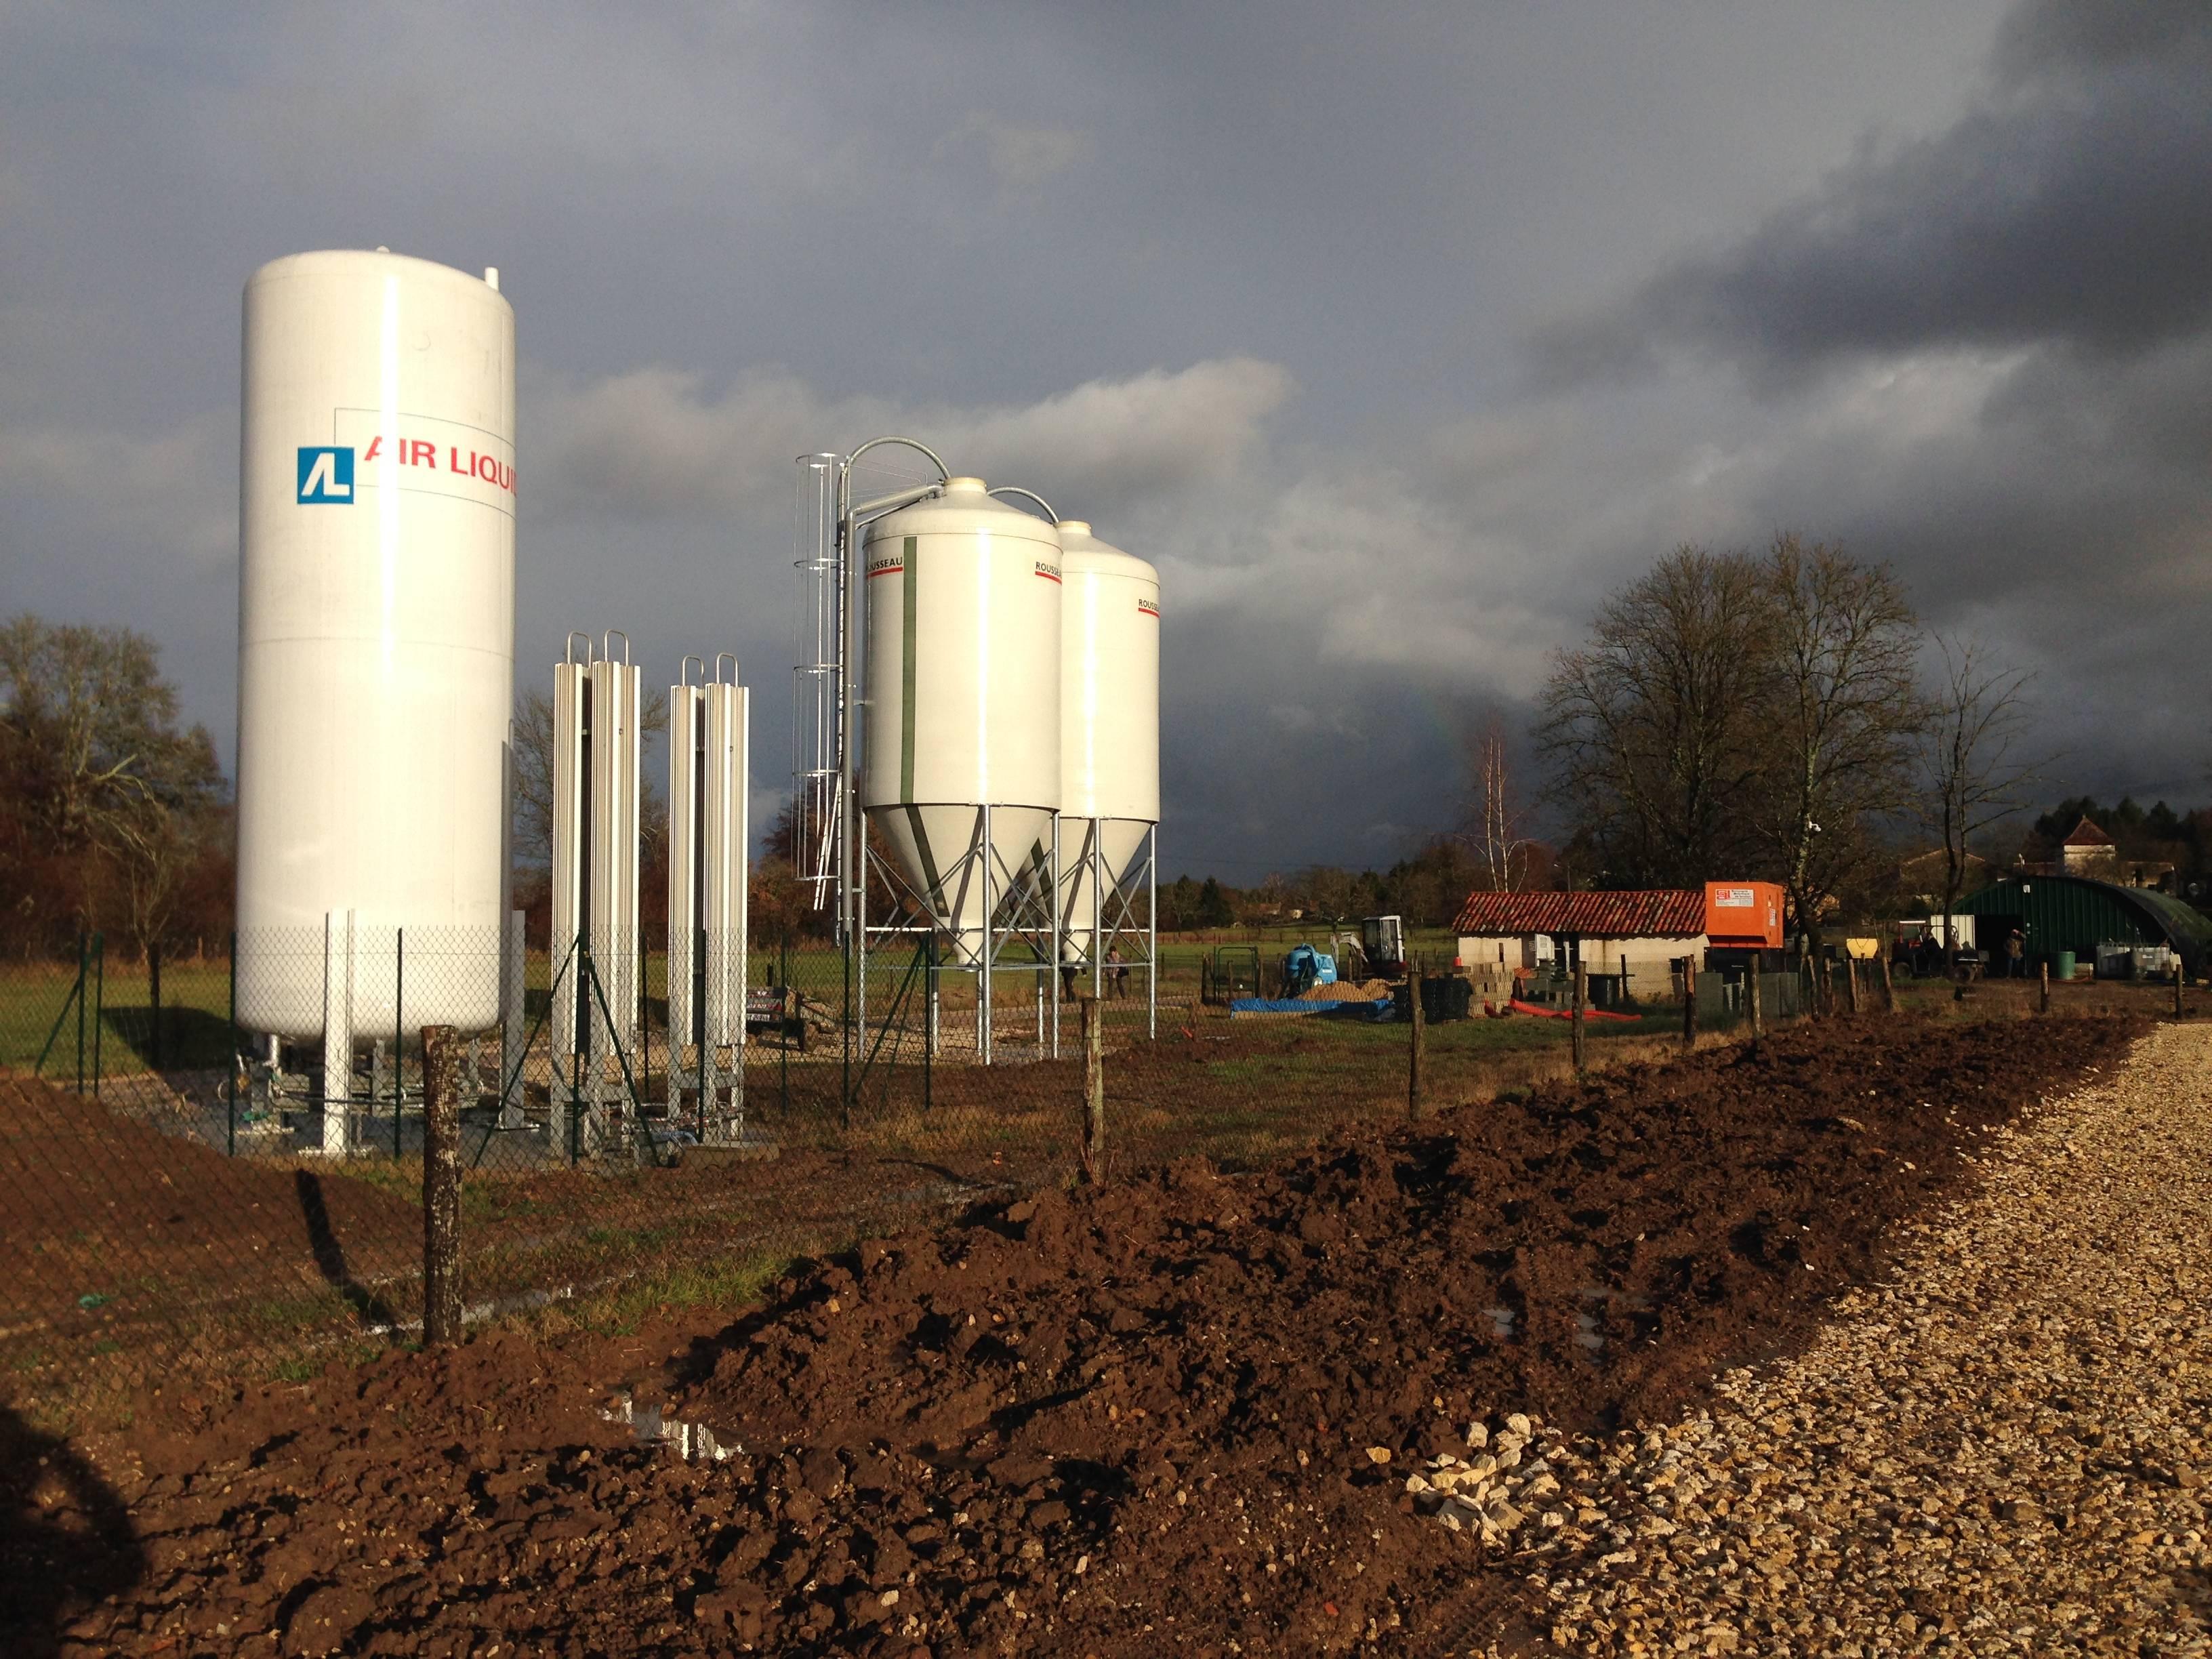 grain silos where every fancy fish food is kept